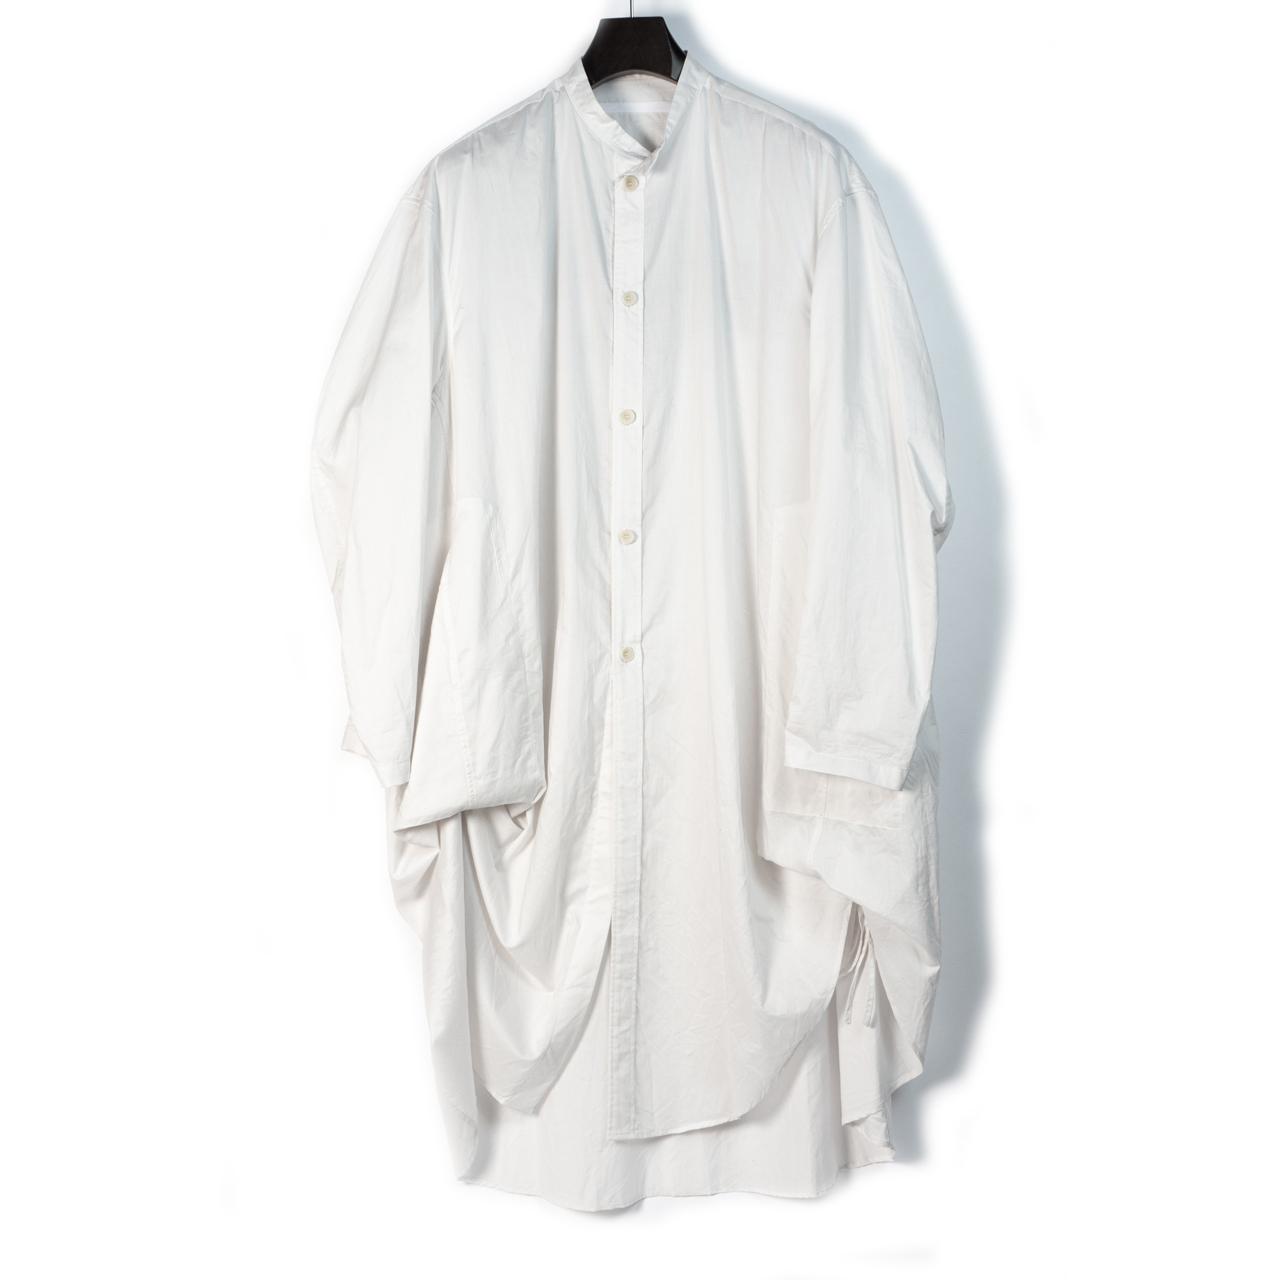 697SHM1-P-WHITE / バックプリントオーバーシャツ